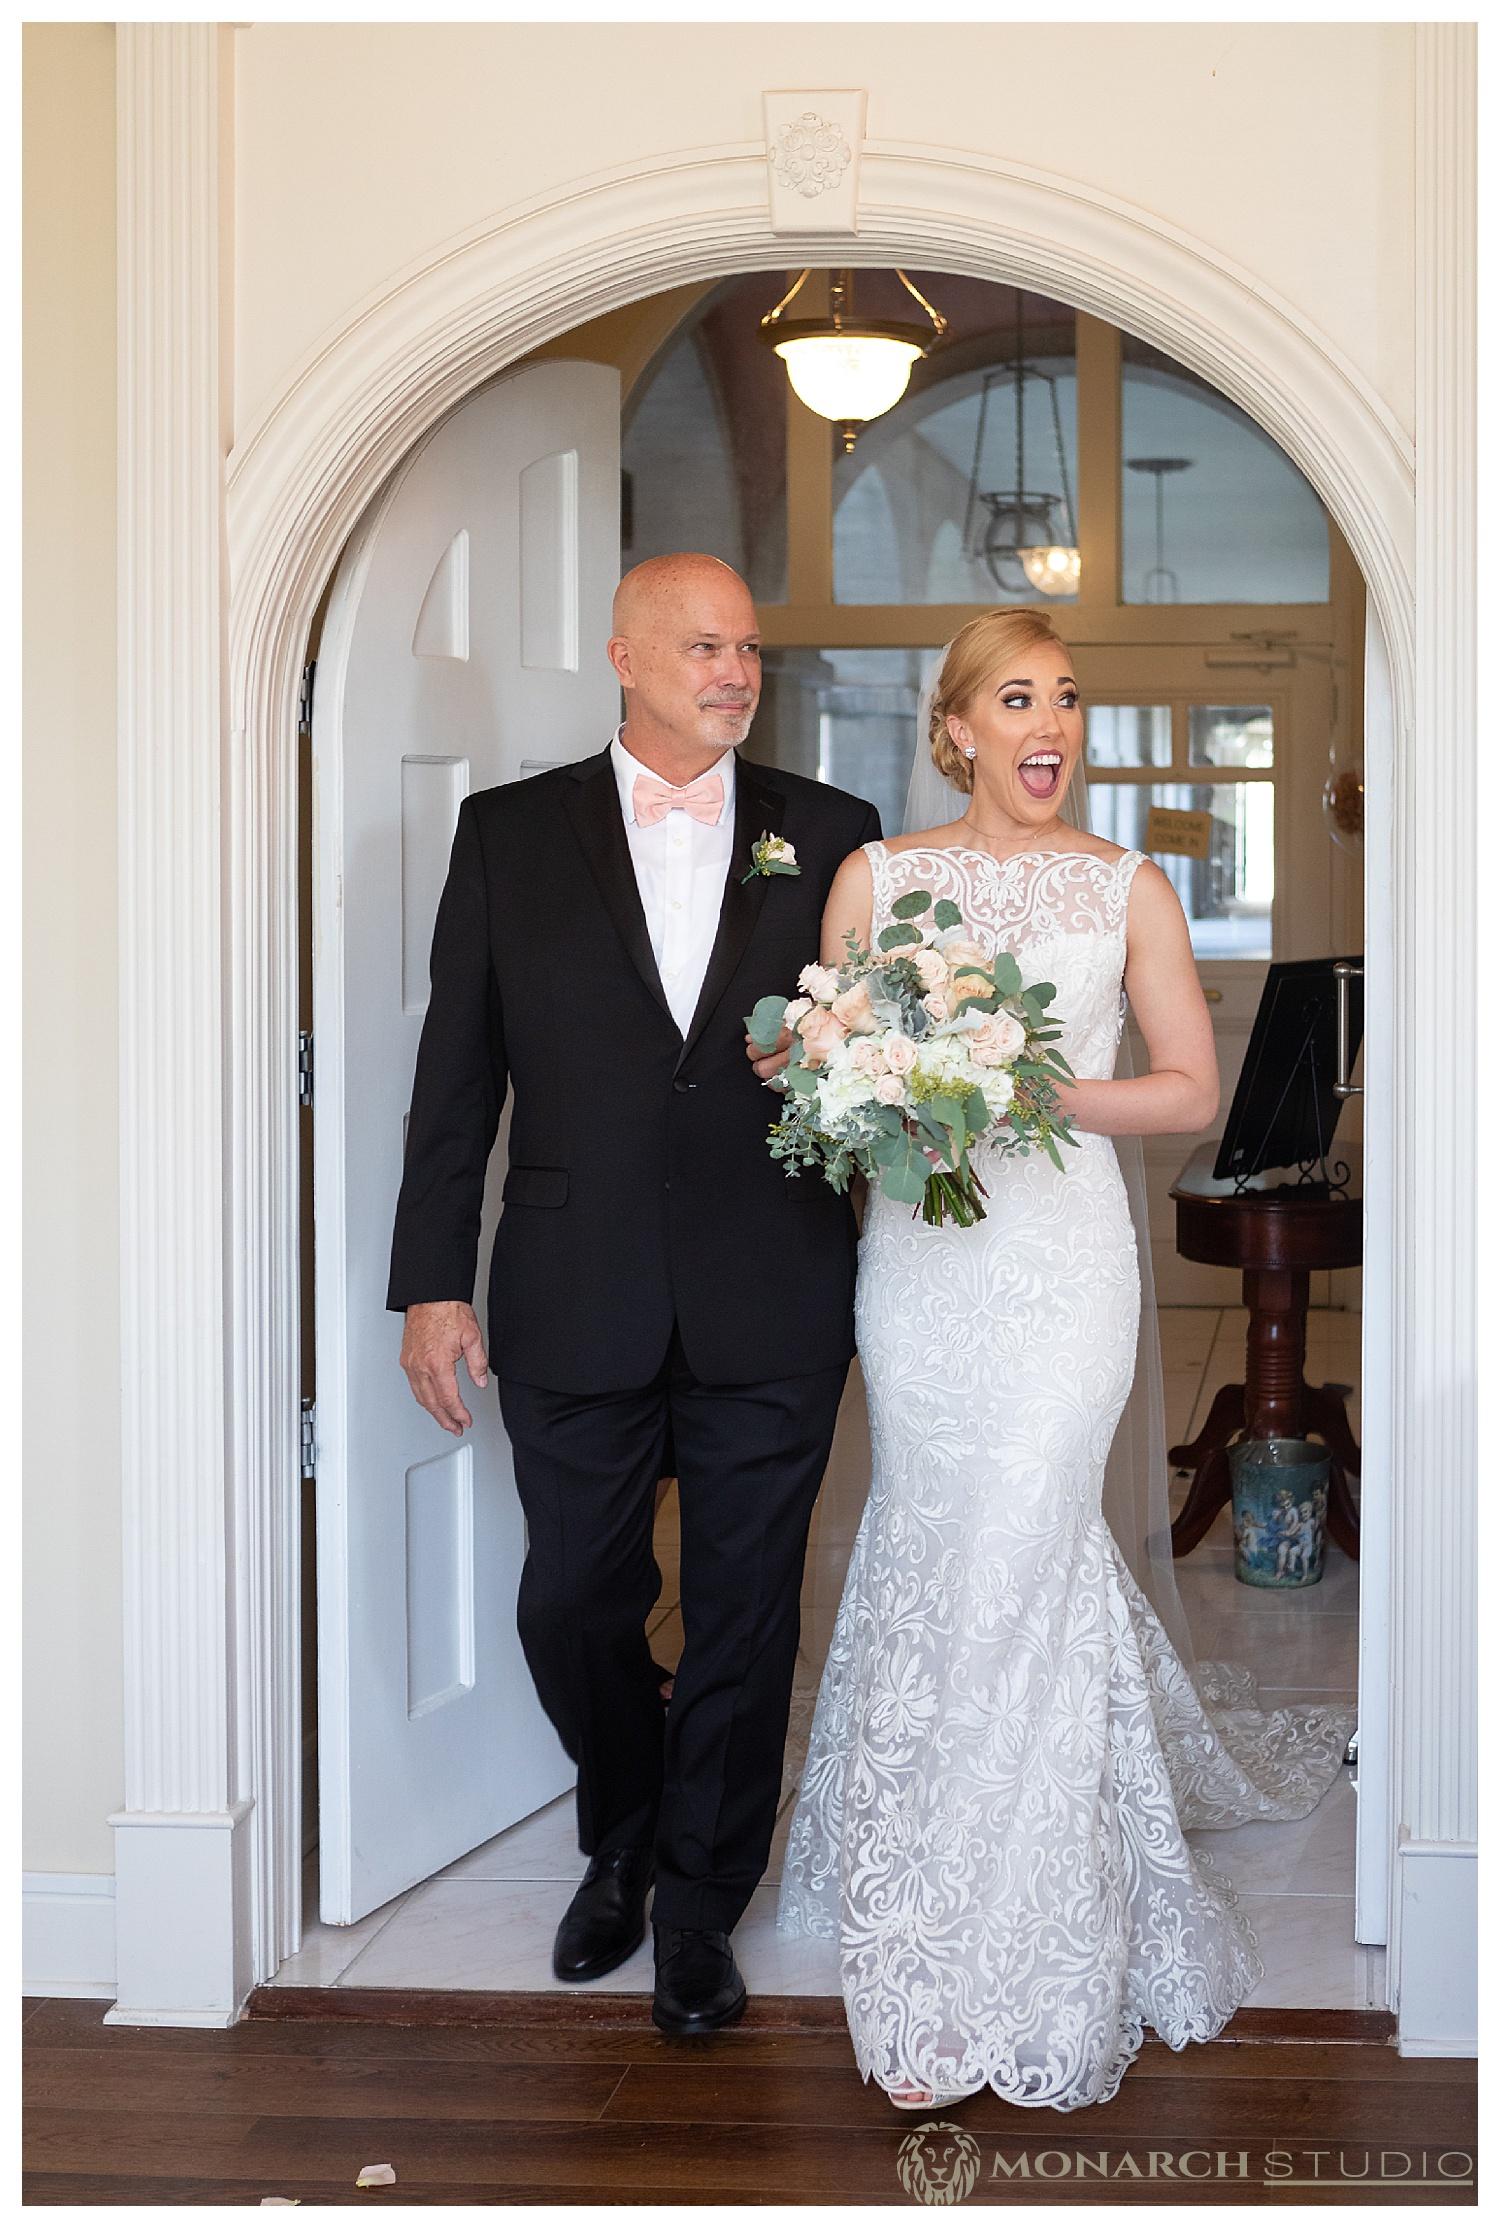 St. Augustine Wedding - Amore Wedding Chapel - 028.JPG